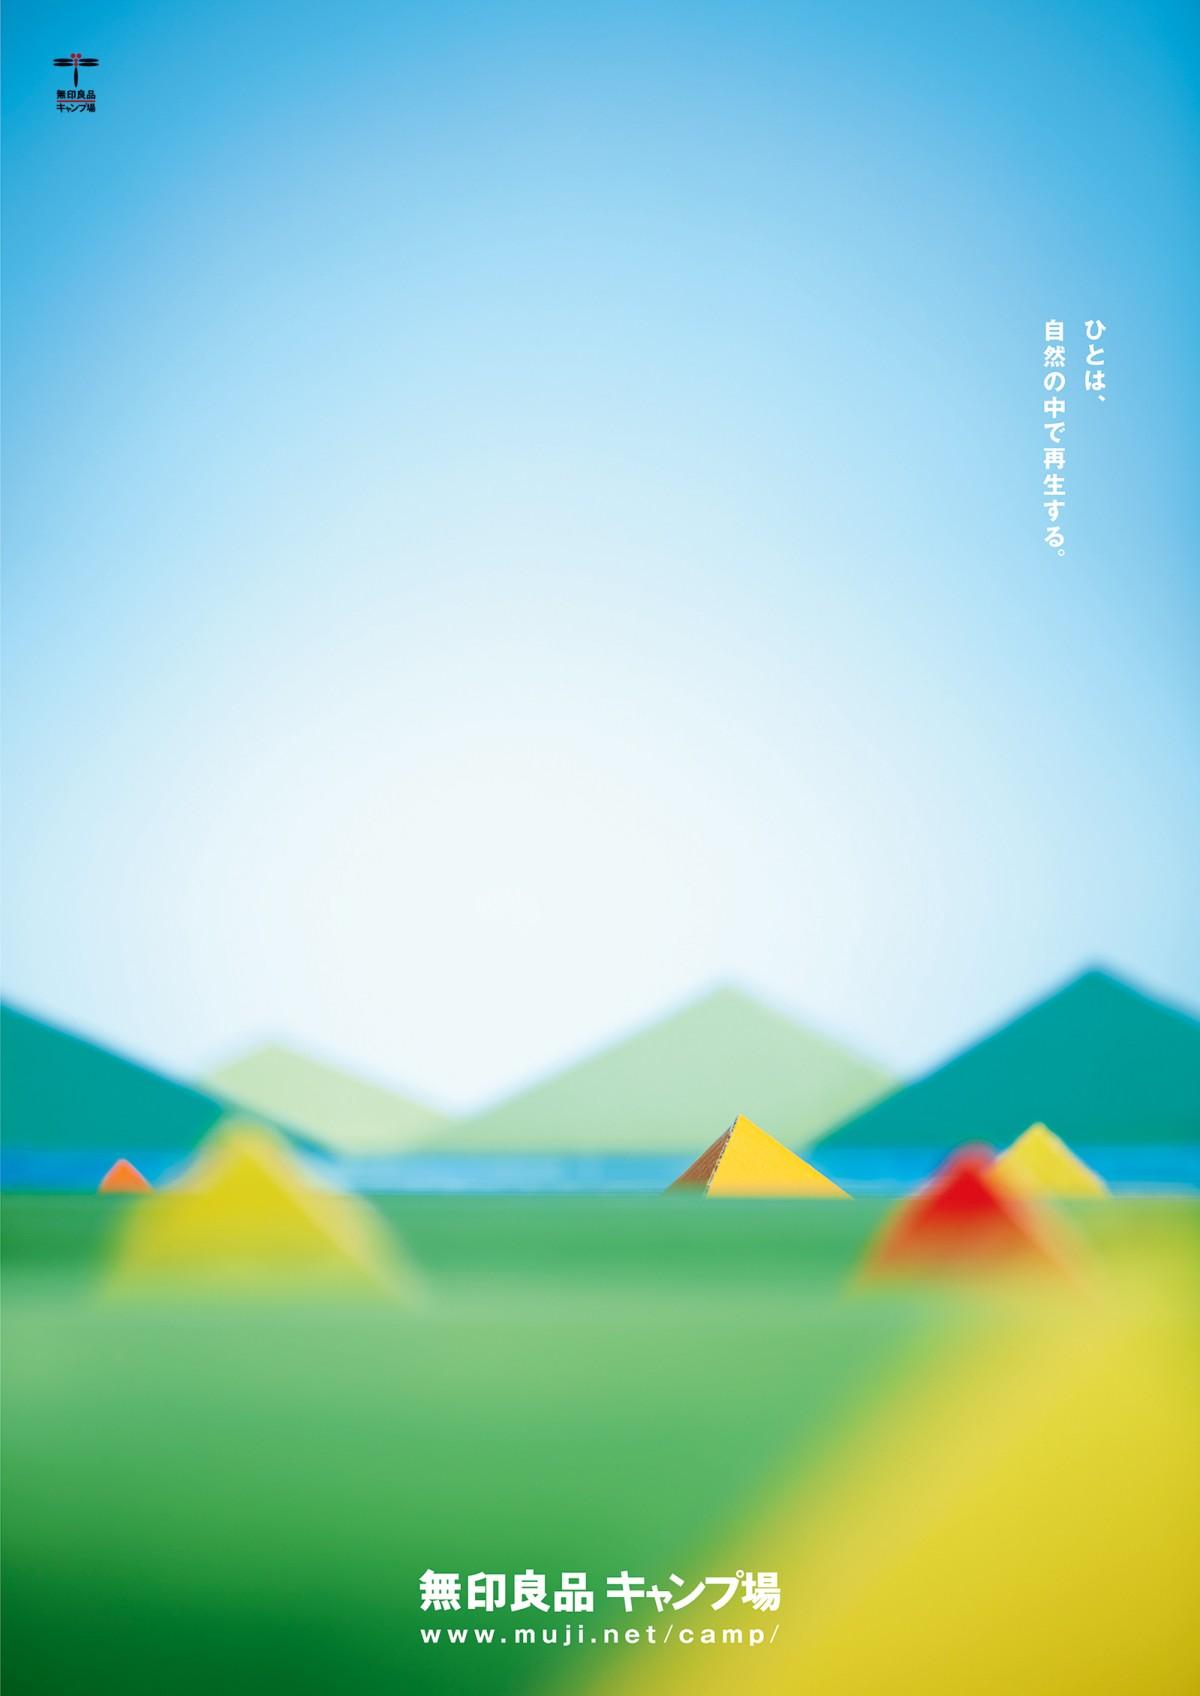 無印良品キャンプ場 2019 | 新村則人・庭野広祐